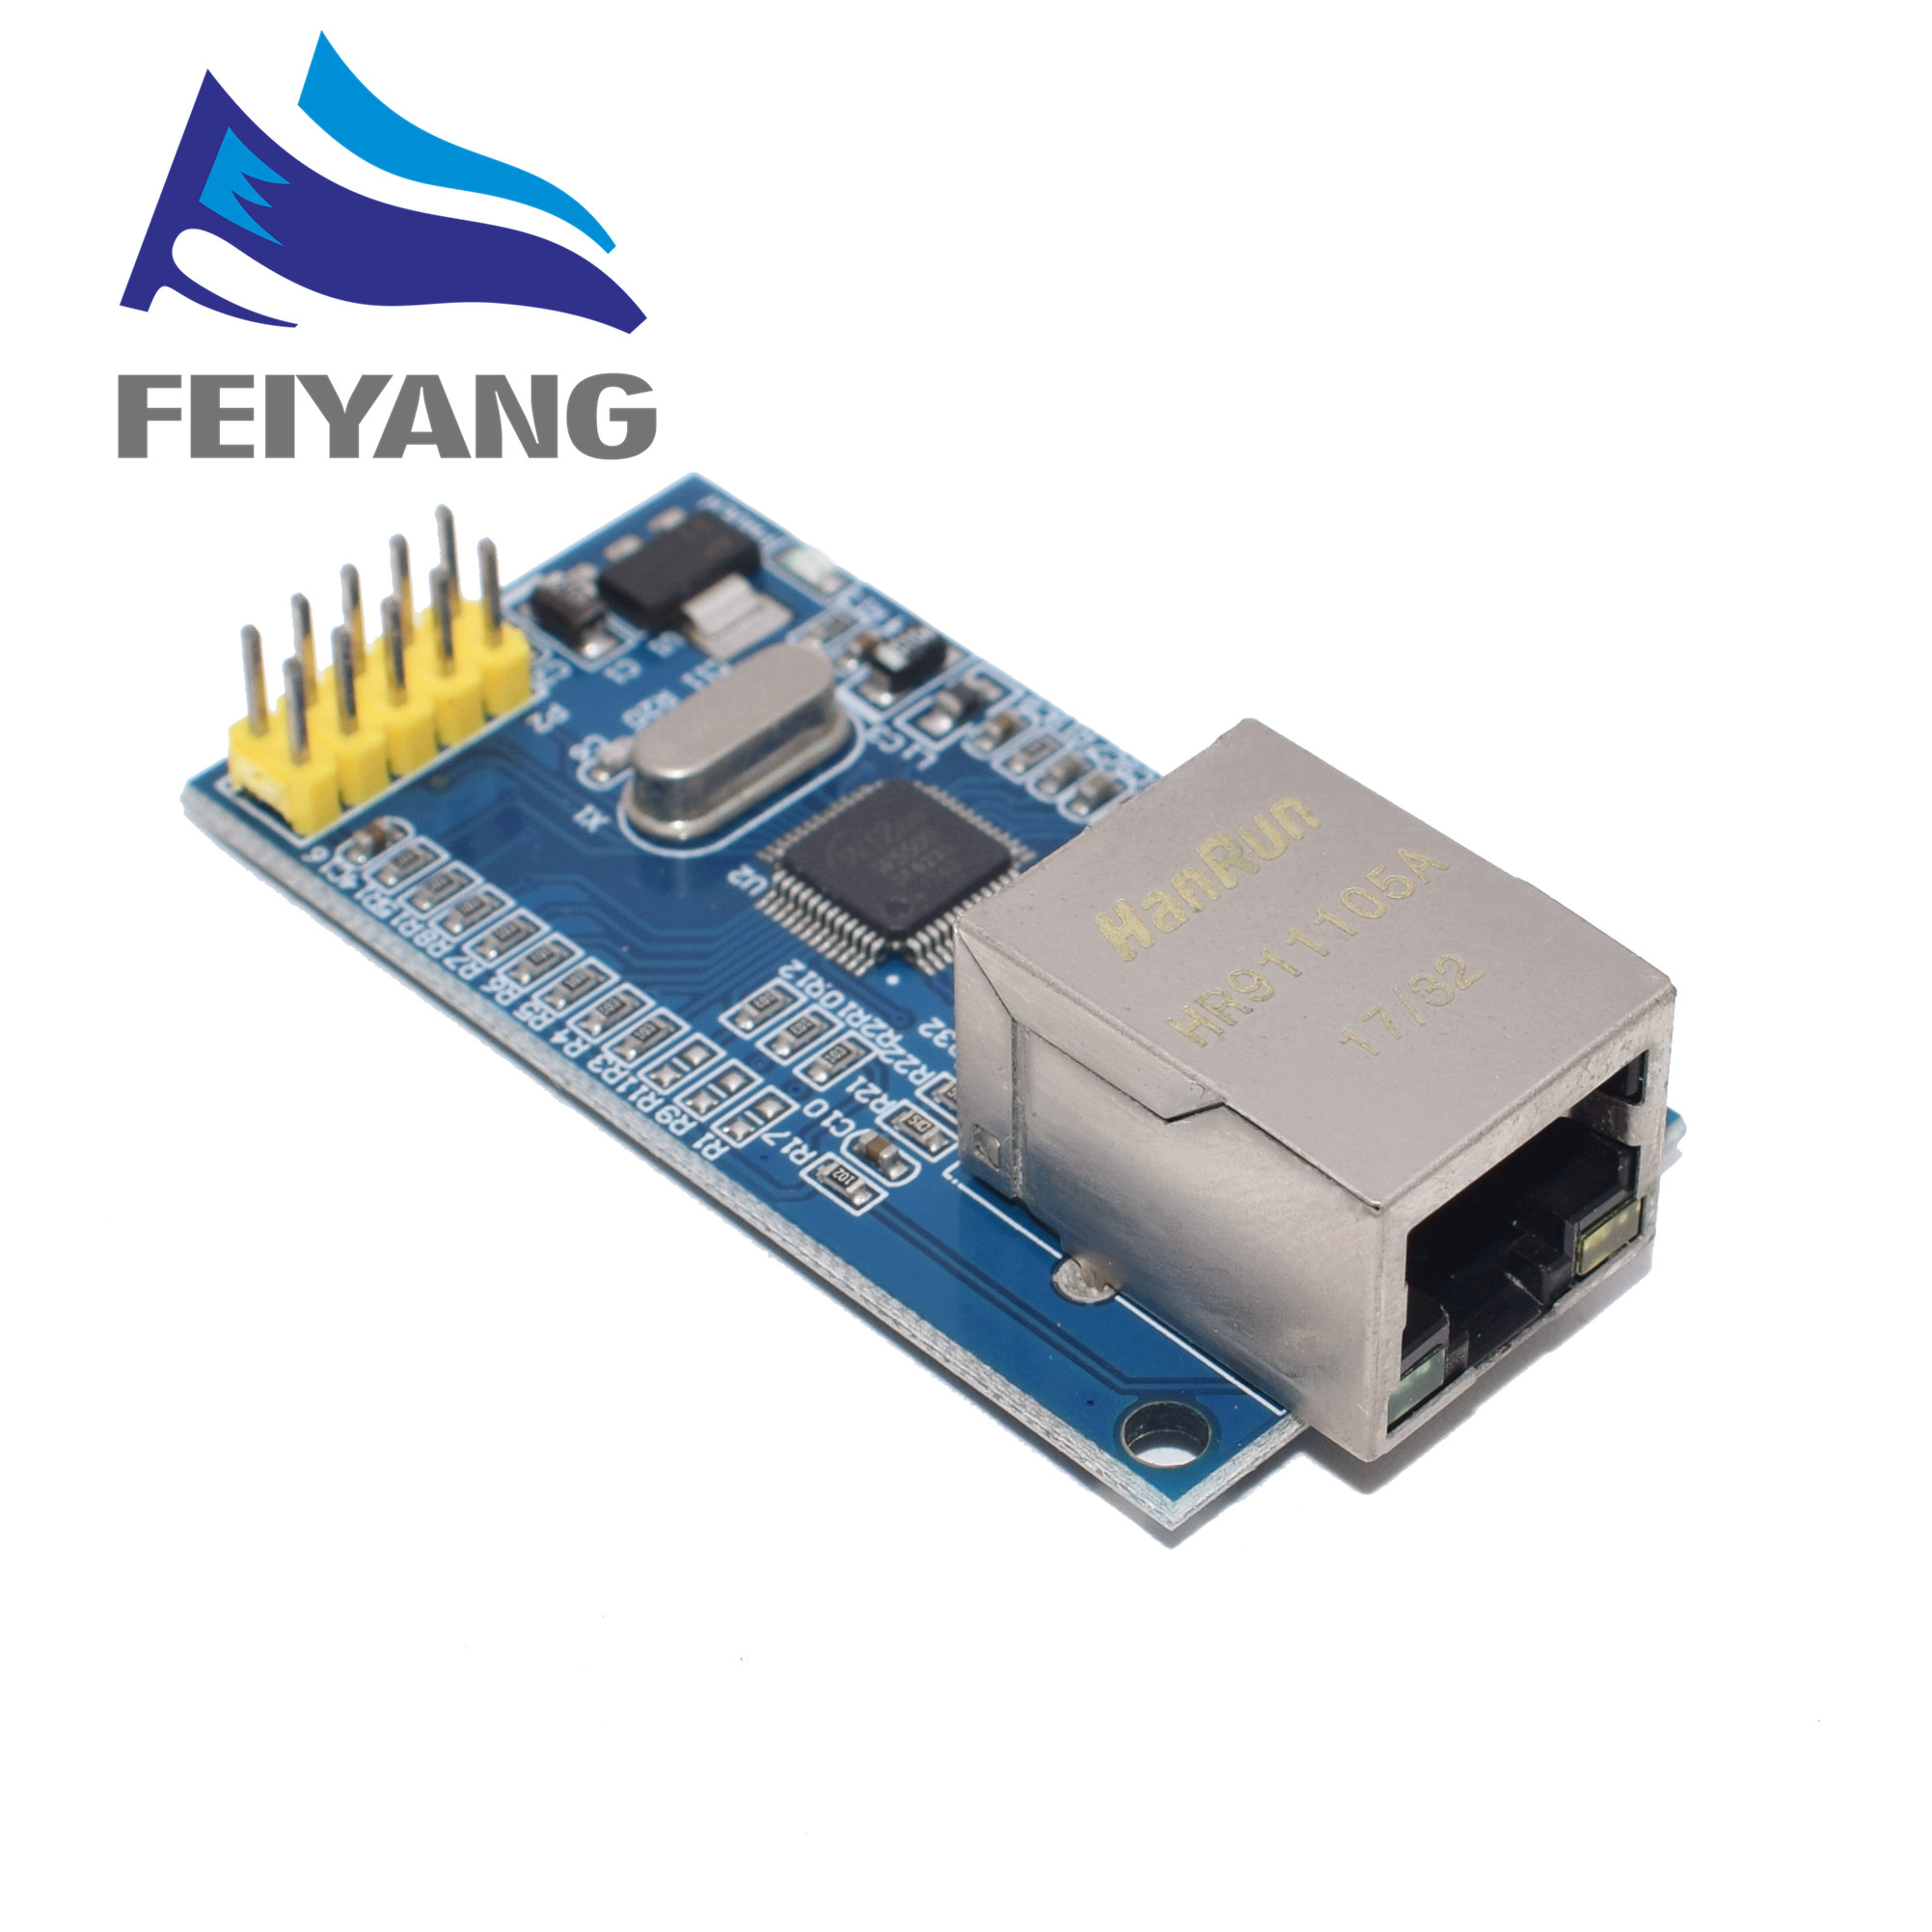 10pcs W5500 Ethernet network module hardware TCP IP 51 STM32 microcontroller program over W5100